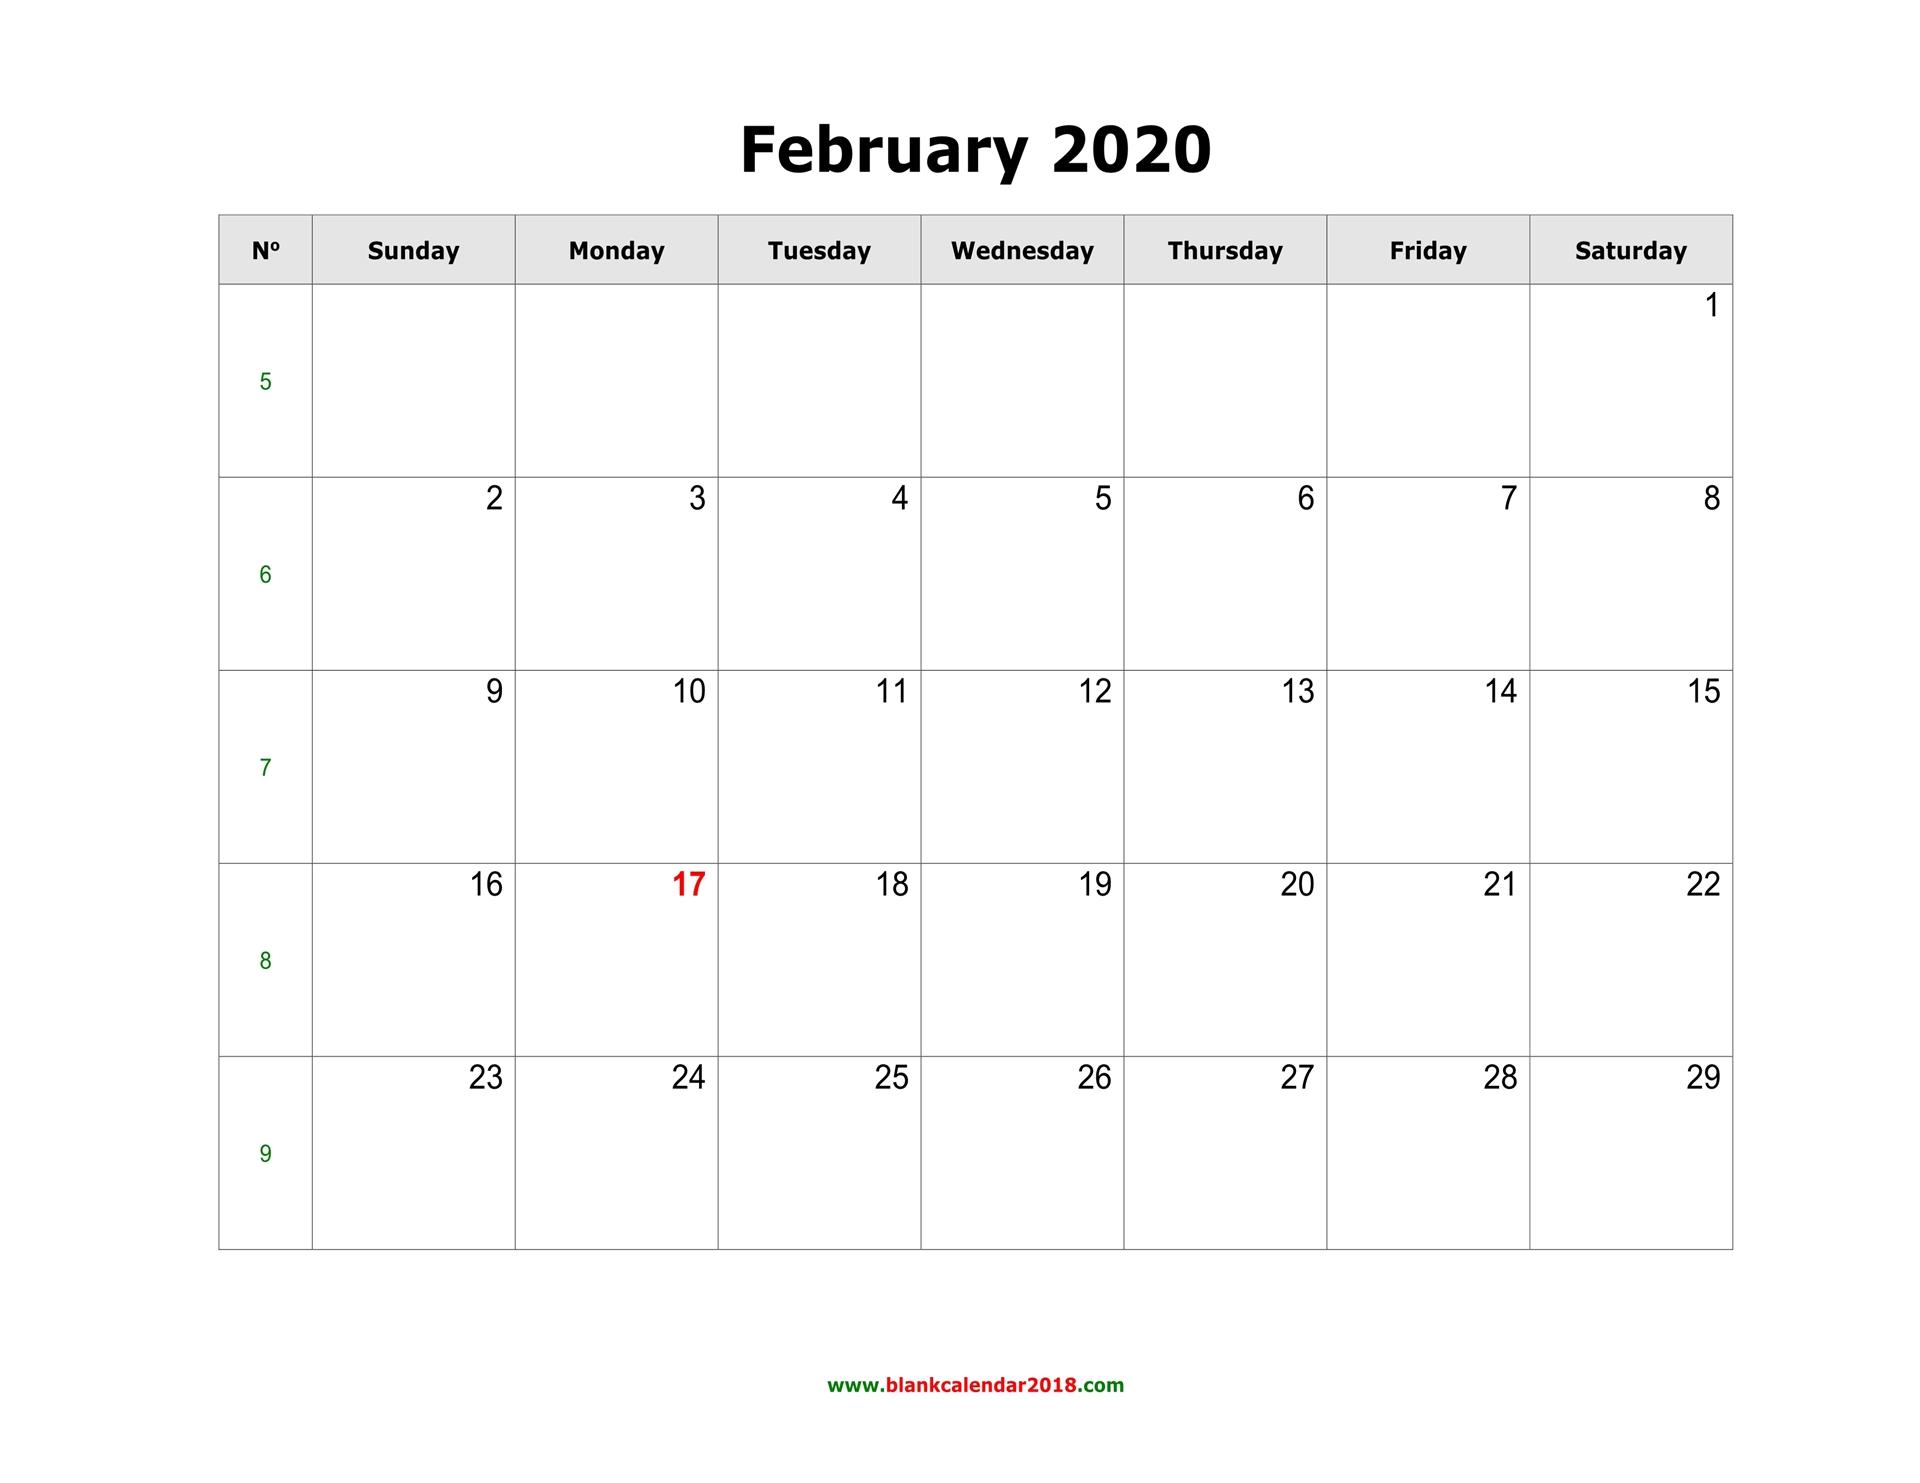 February Printable Calendar 2020.Blank Calendar For February 2020